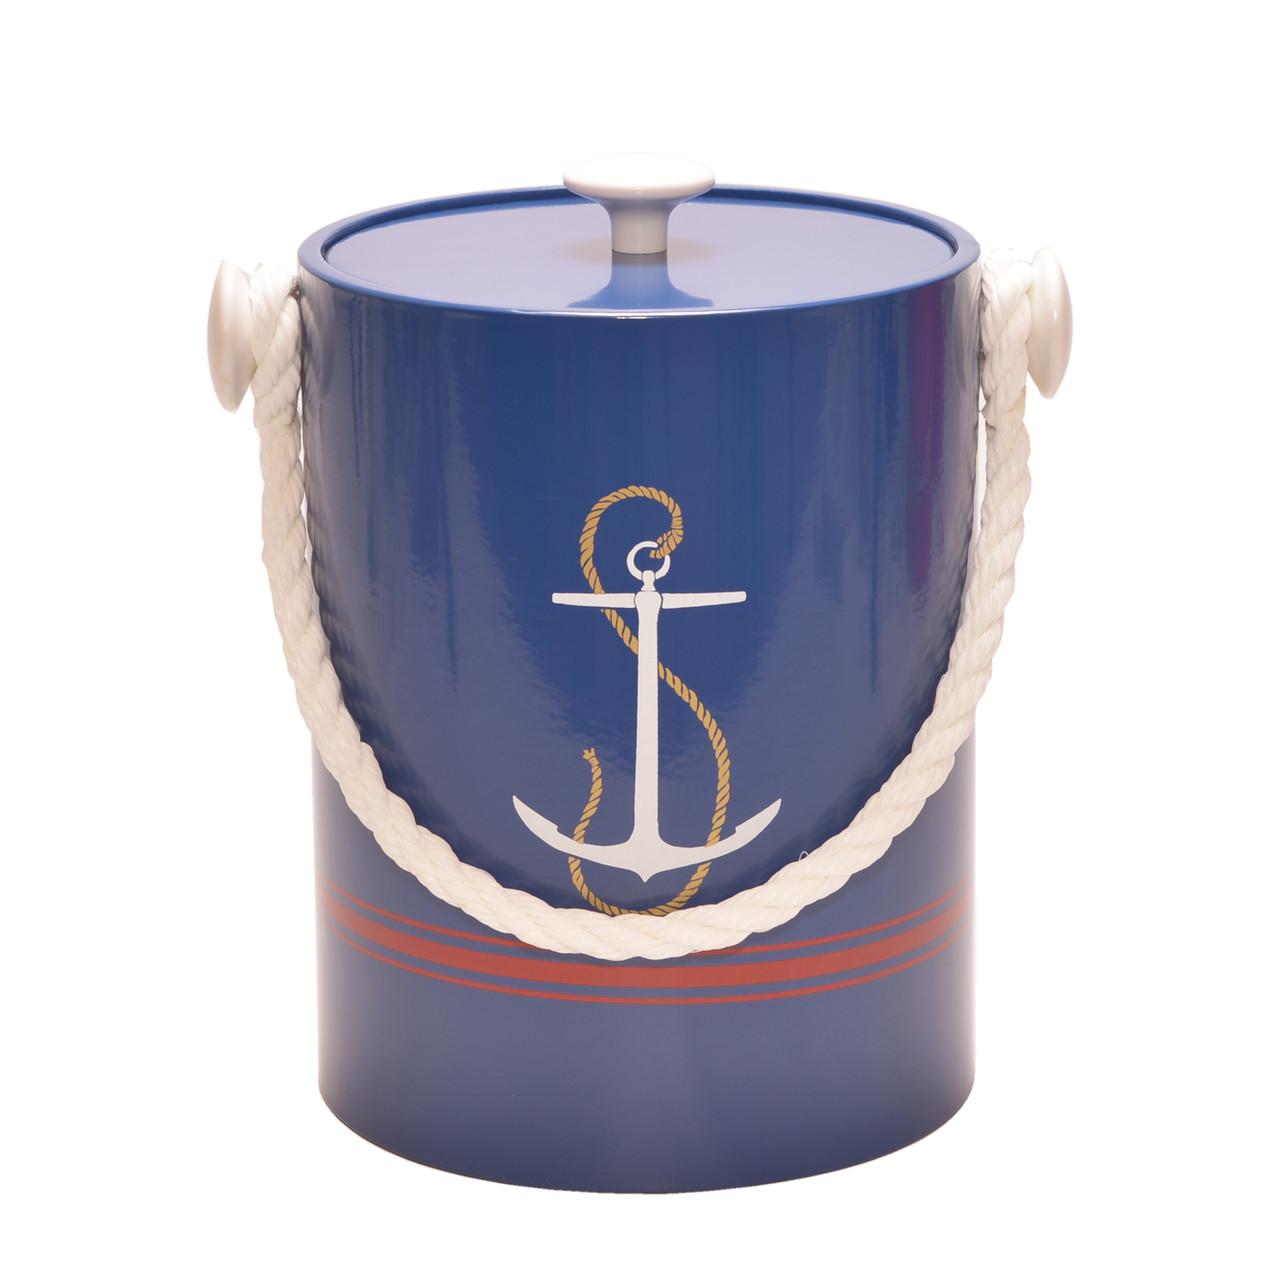 Anchor Blue Ice bucket - 5qt